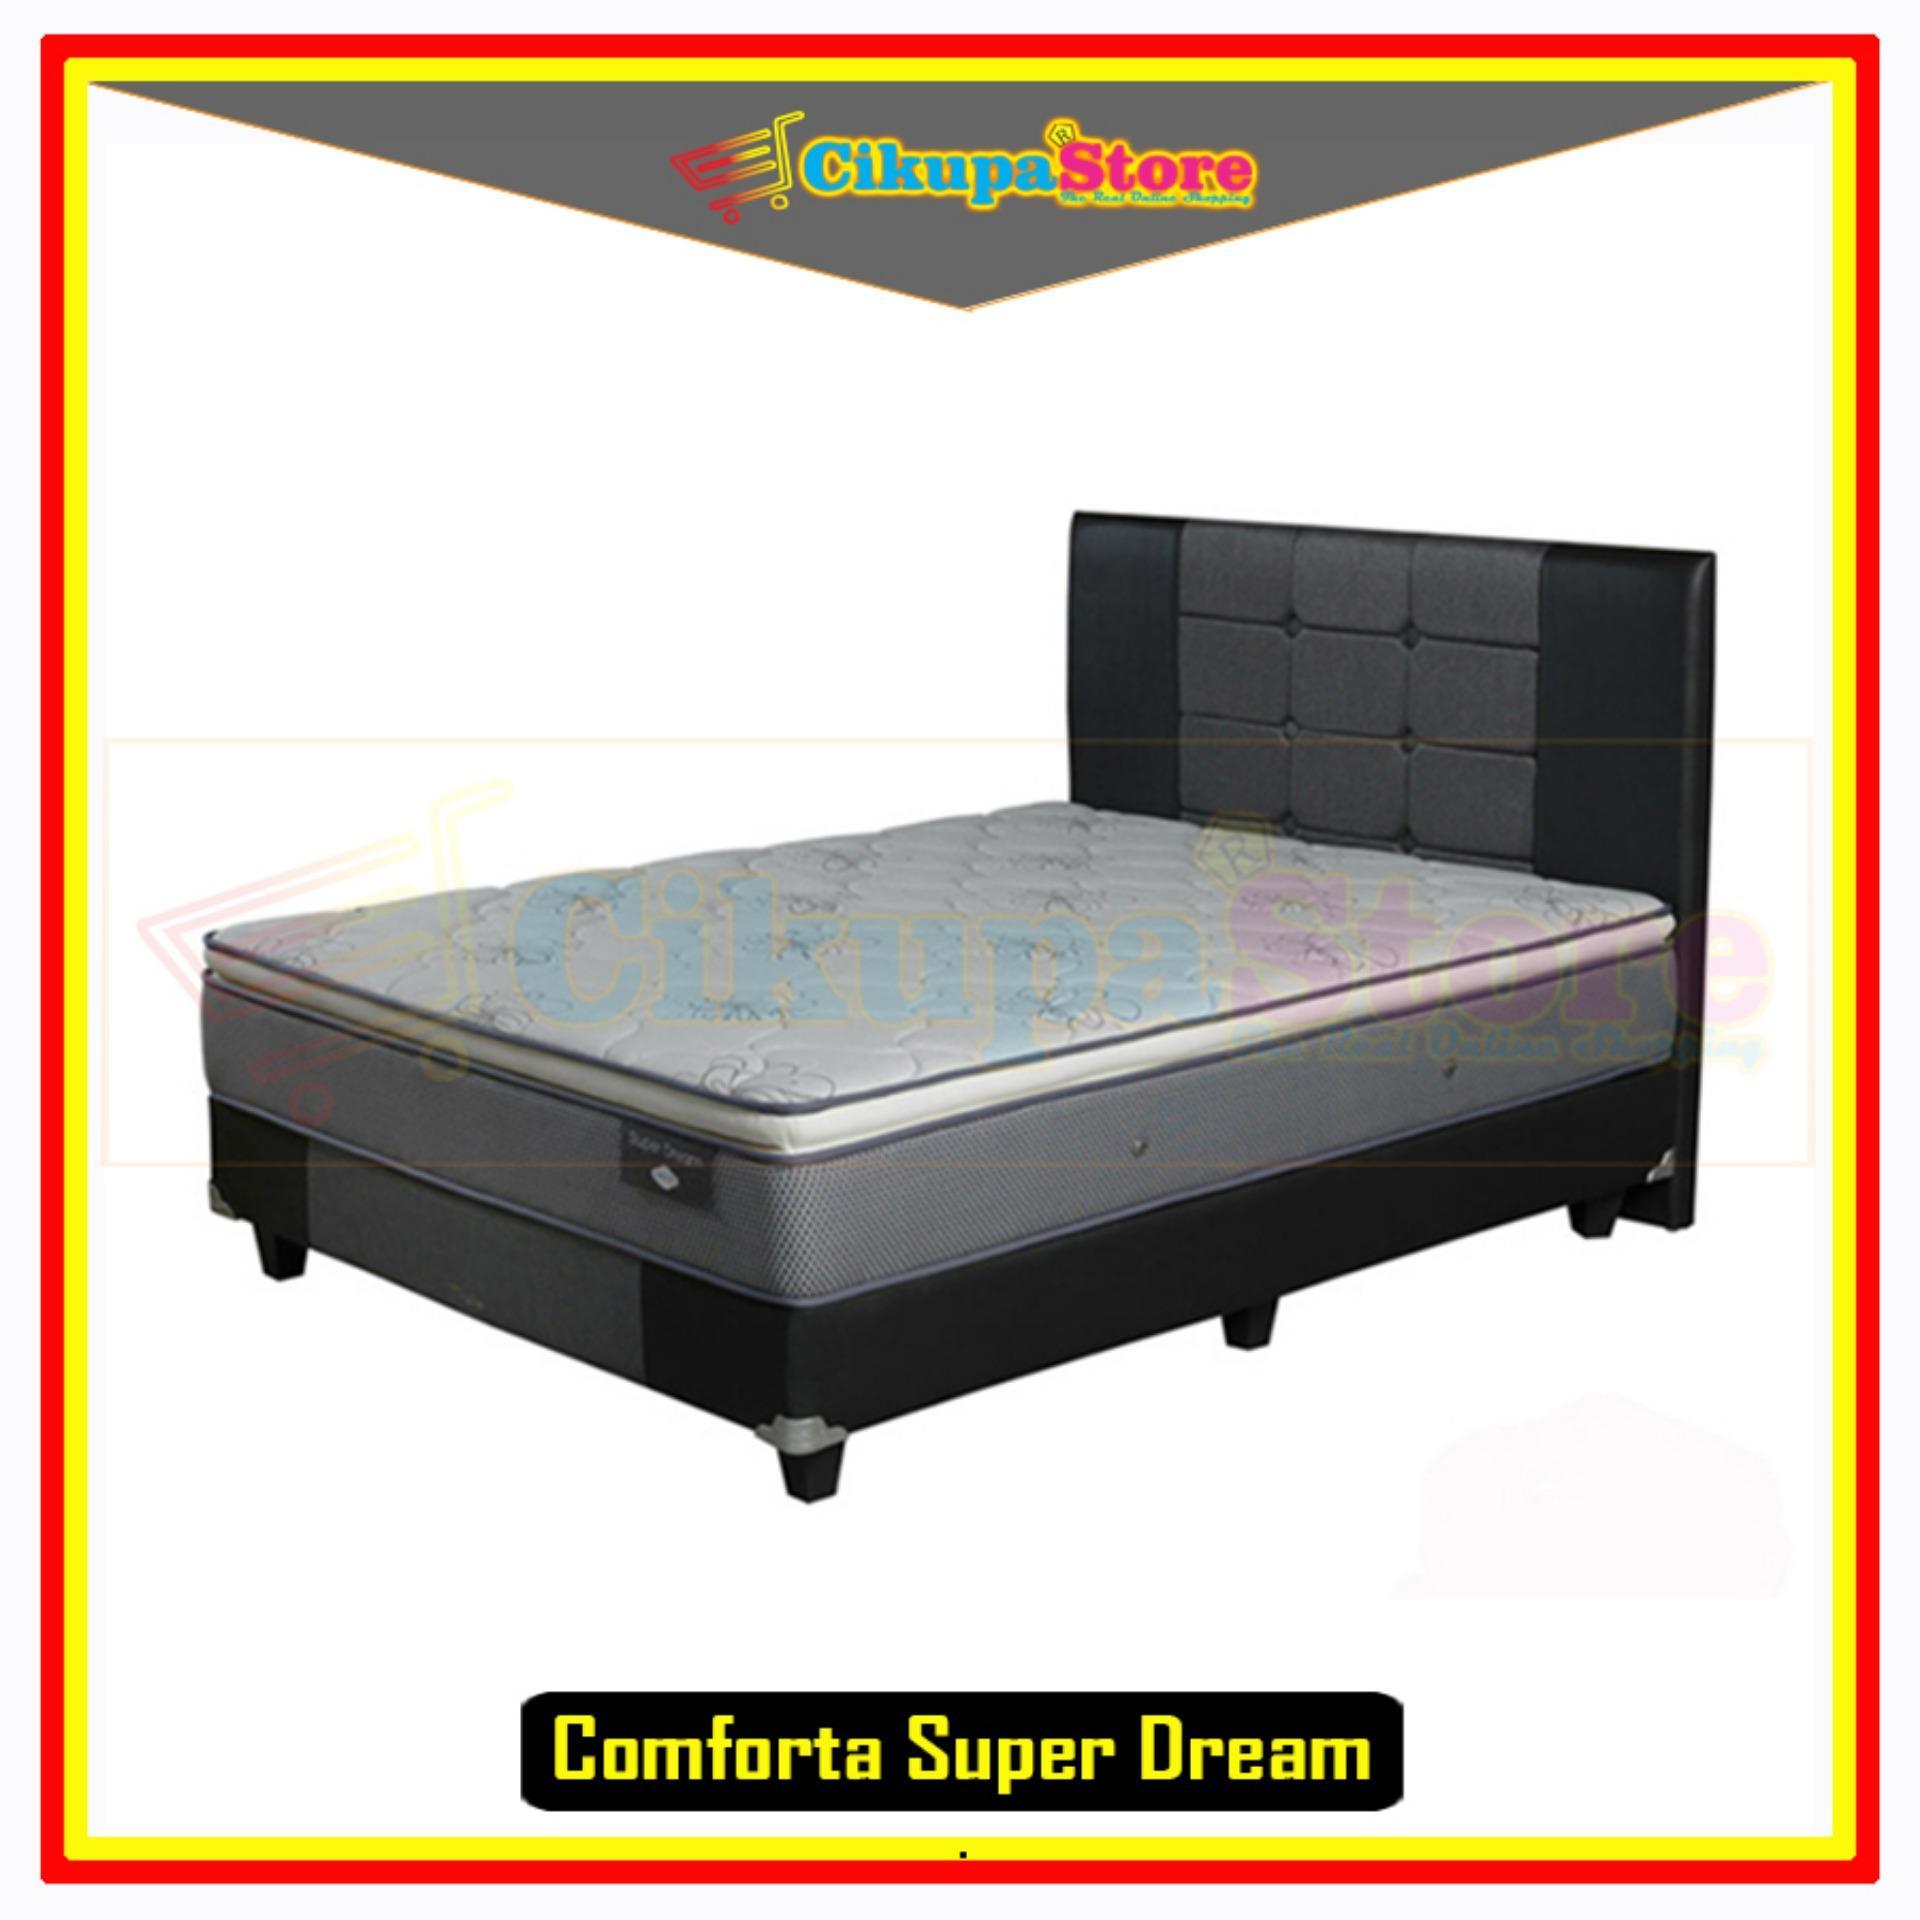 FREE ONGKIR !! Kasur Spring Bed Matras Comforta Super Dream - 160x200 Full Set Divan